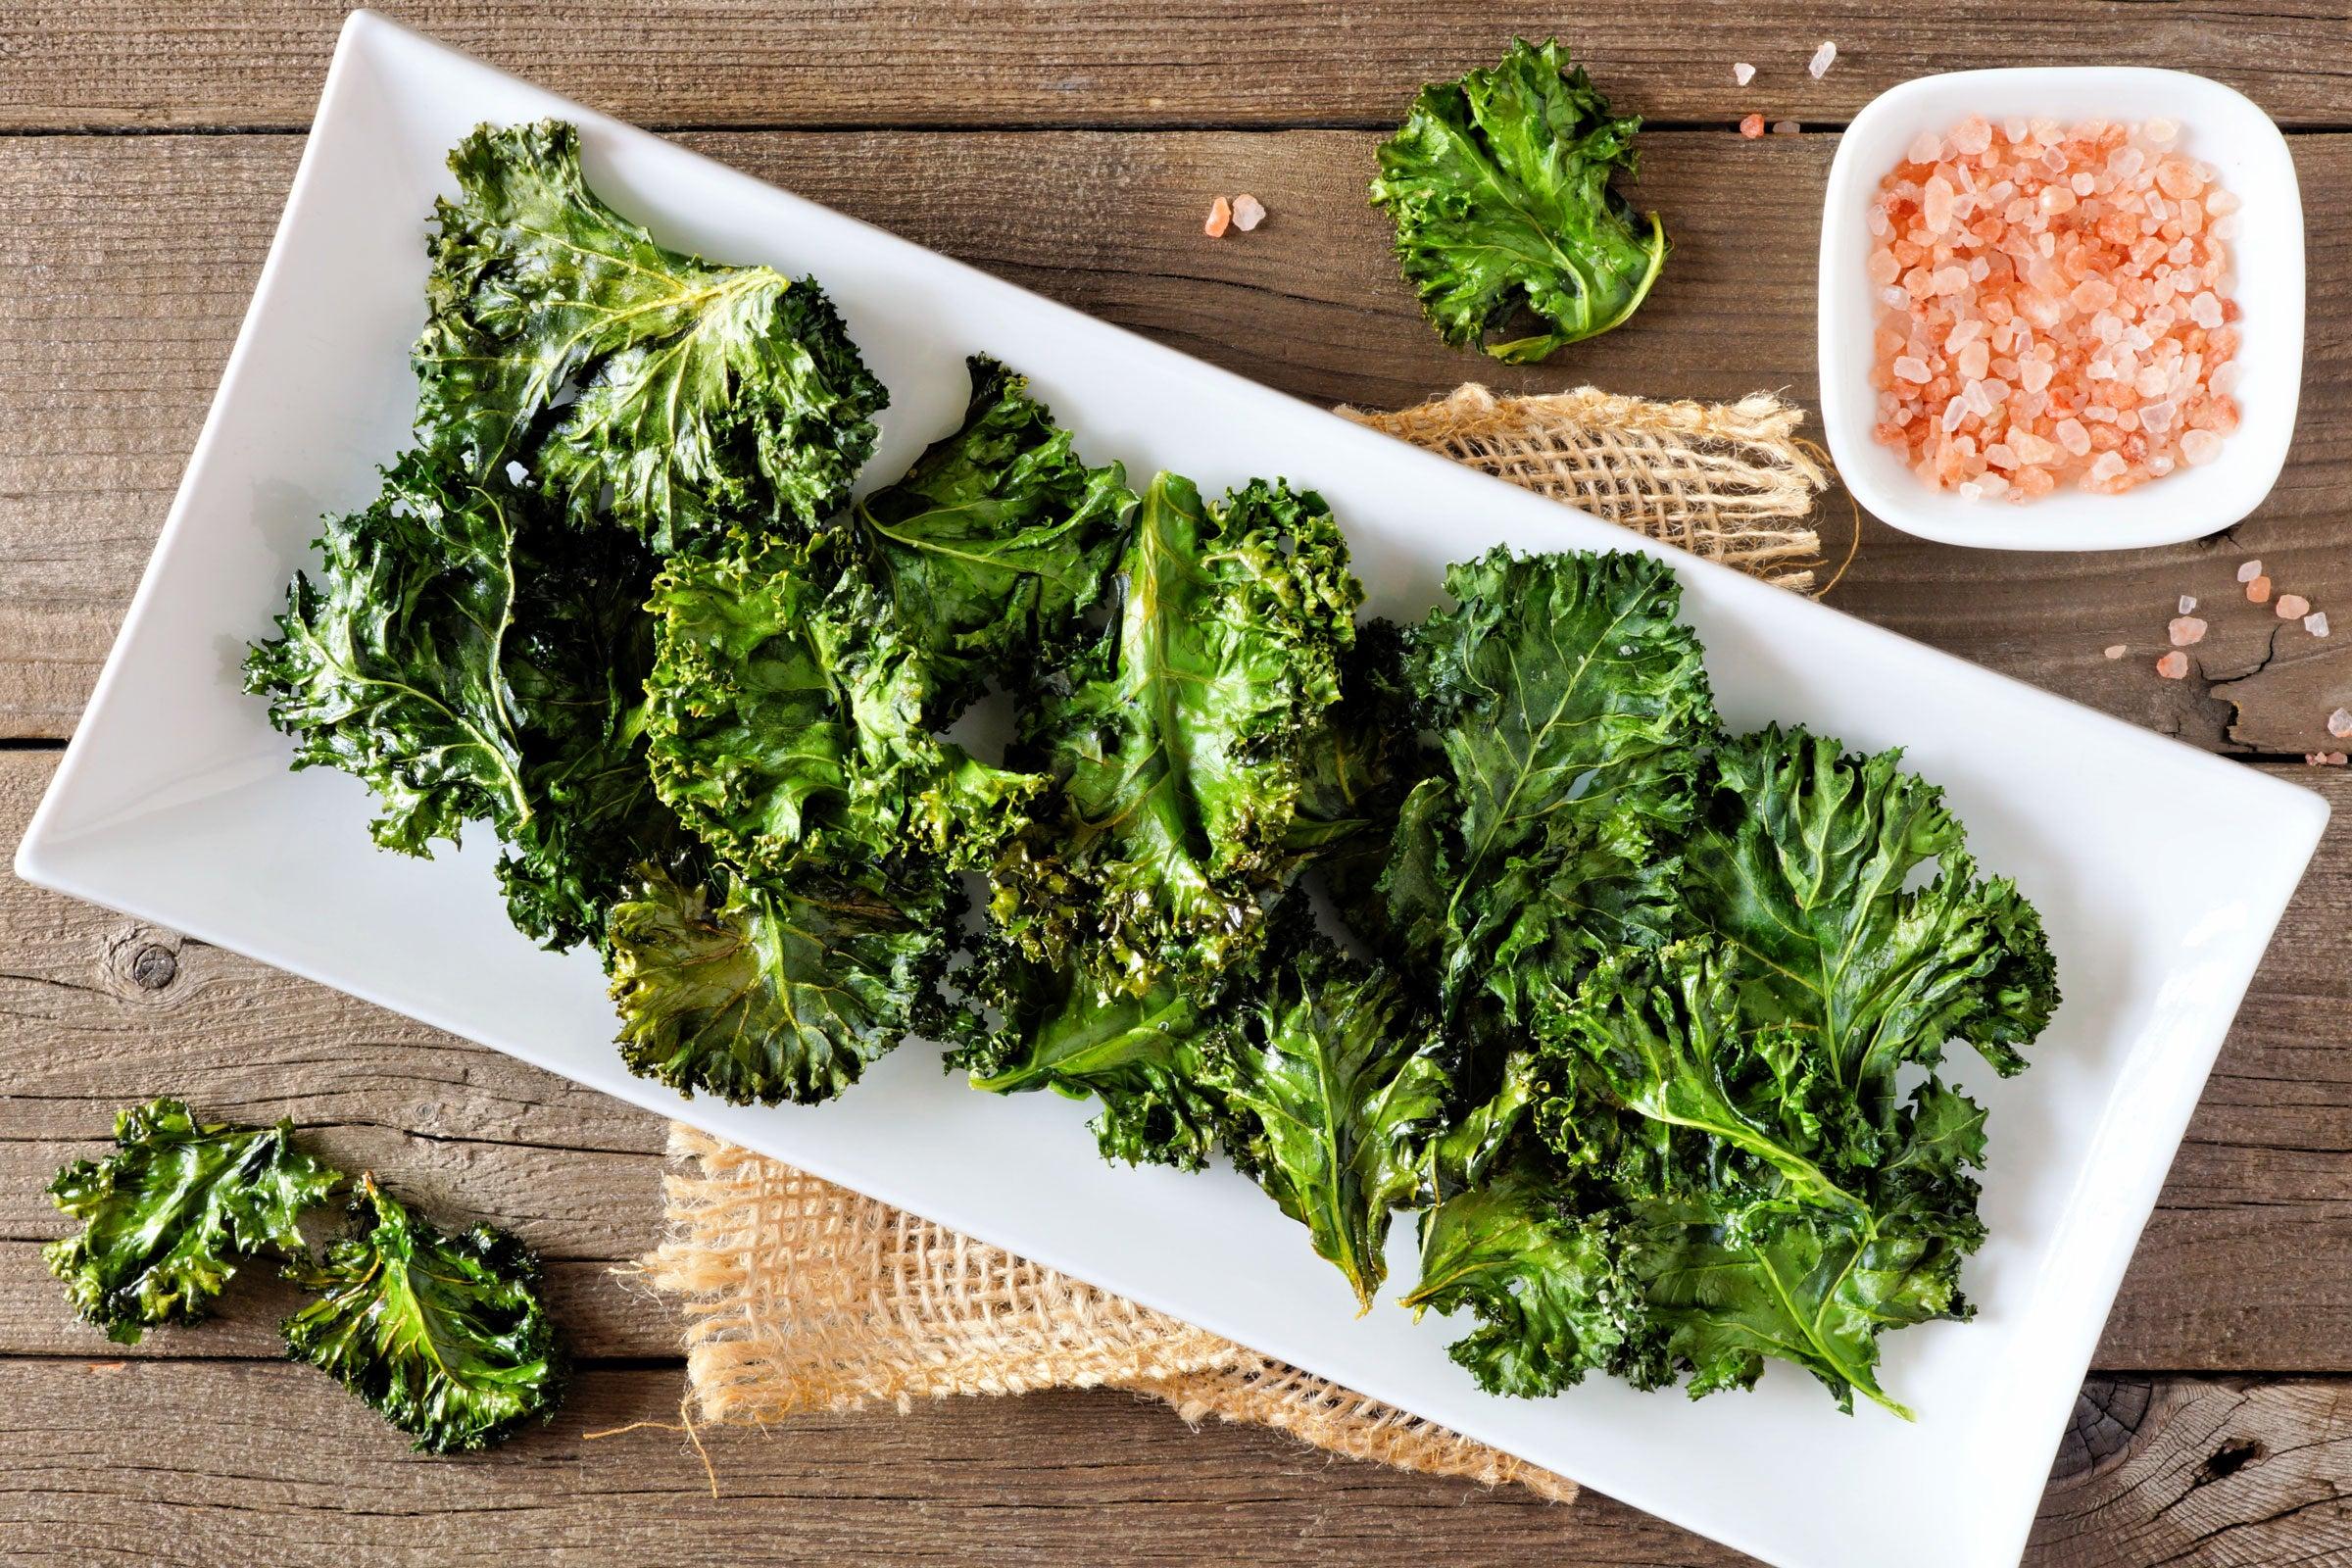 low-carb-kale-chips